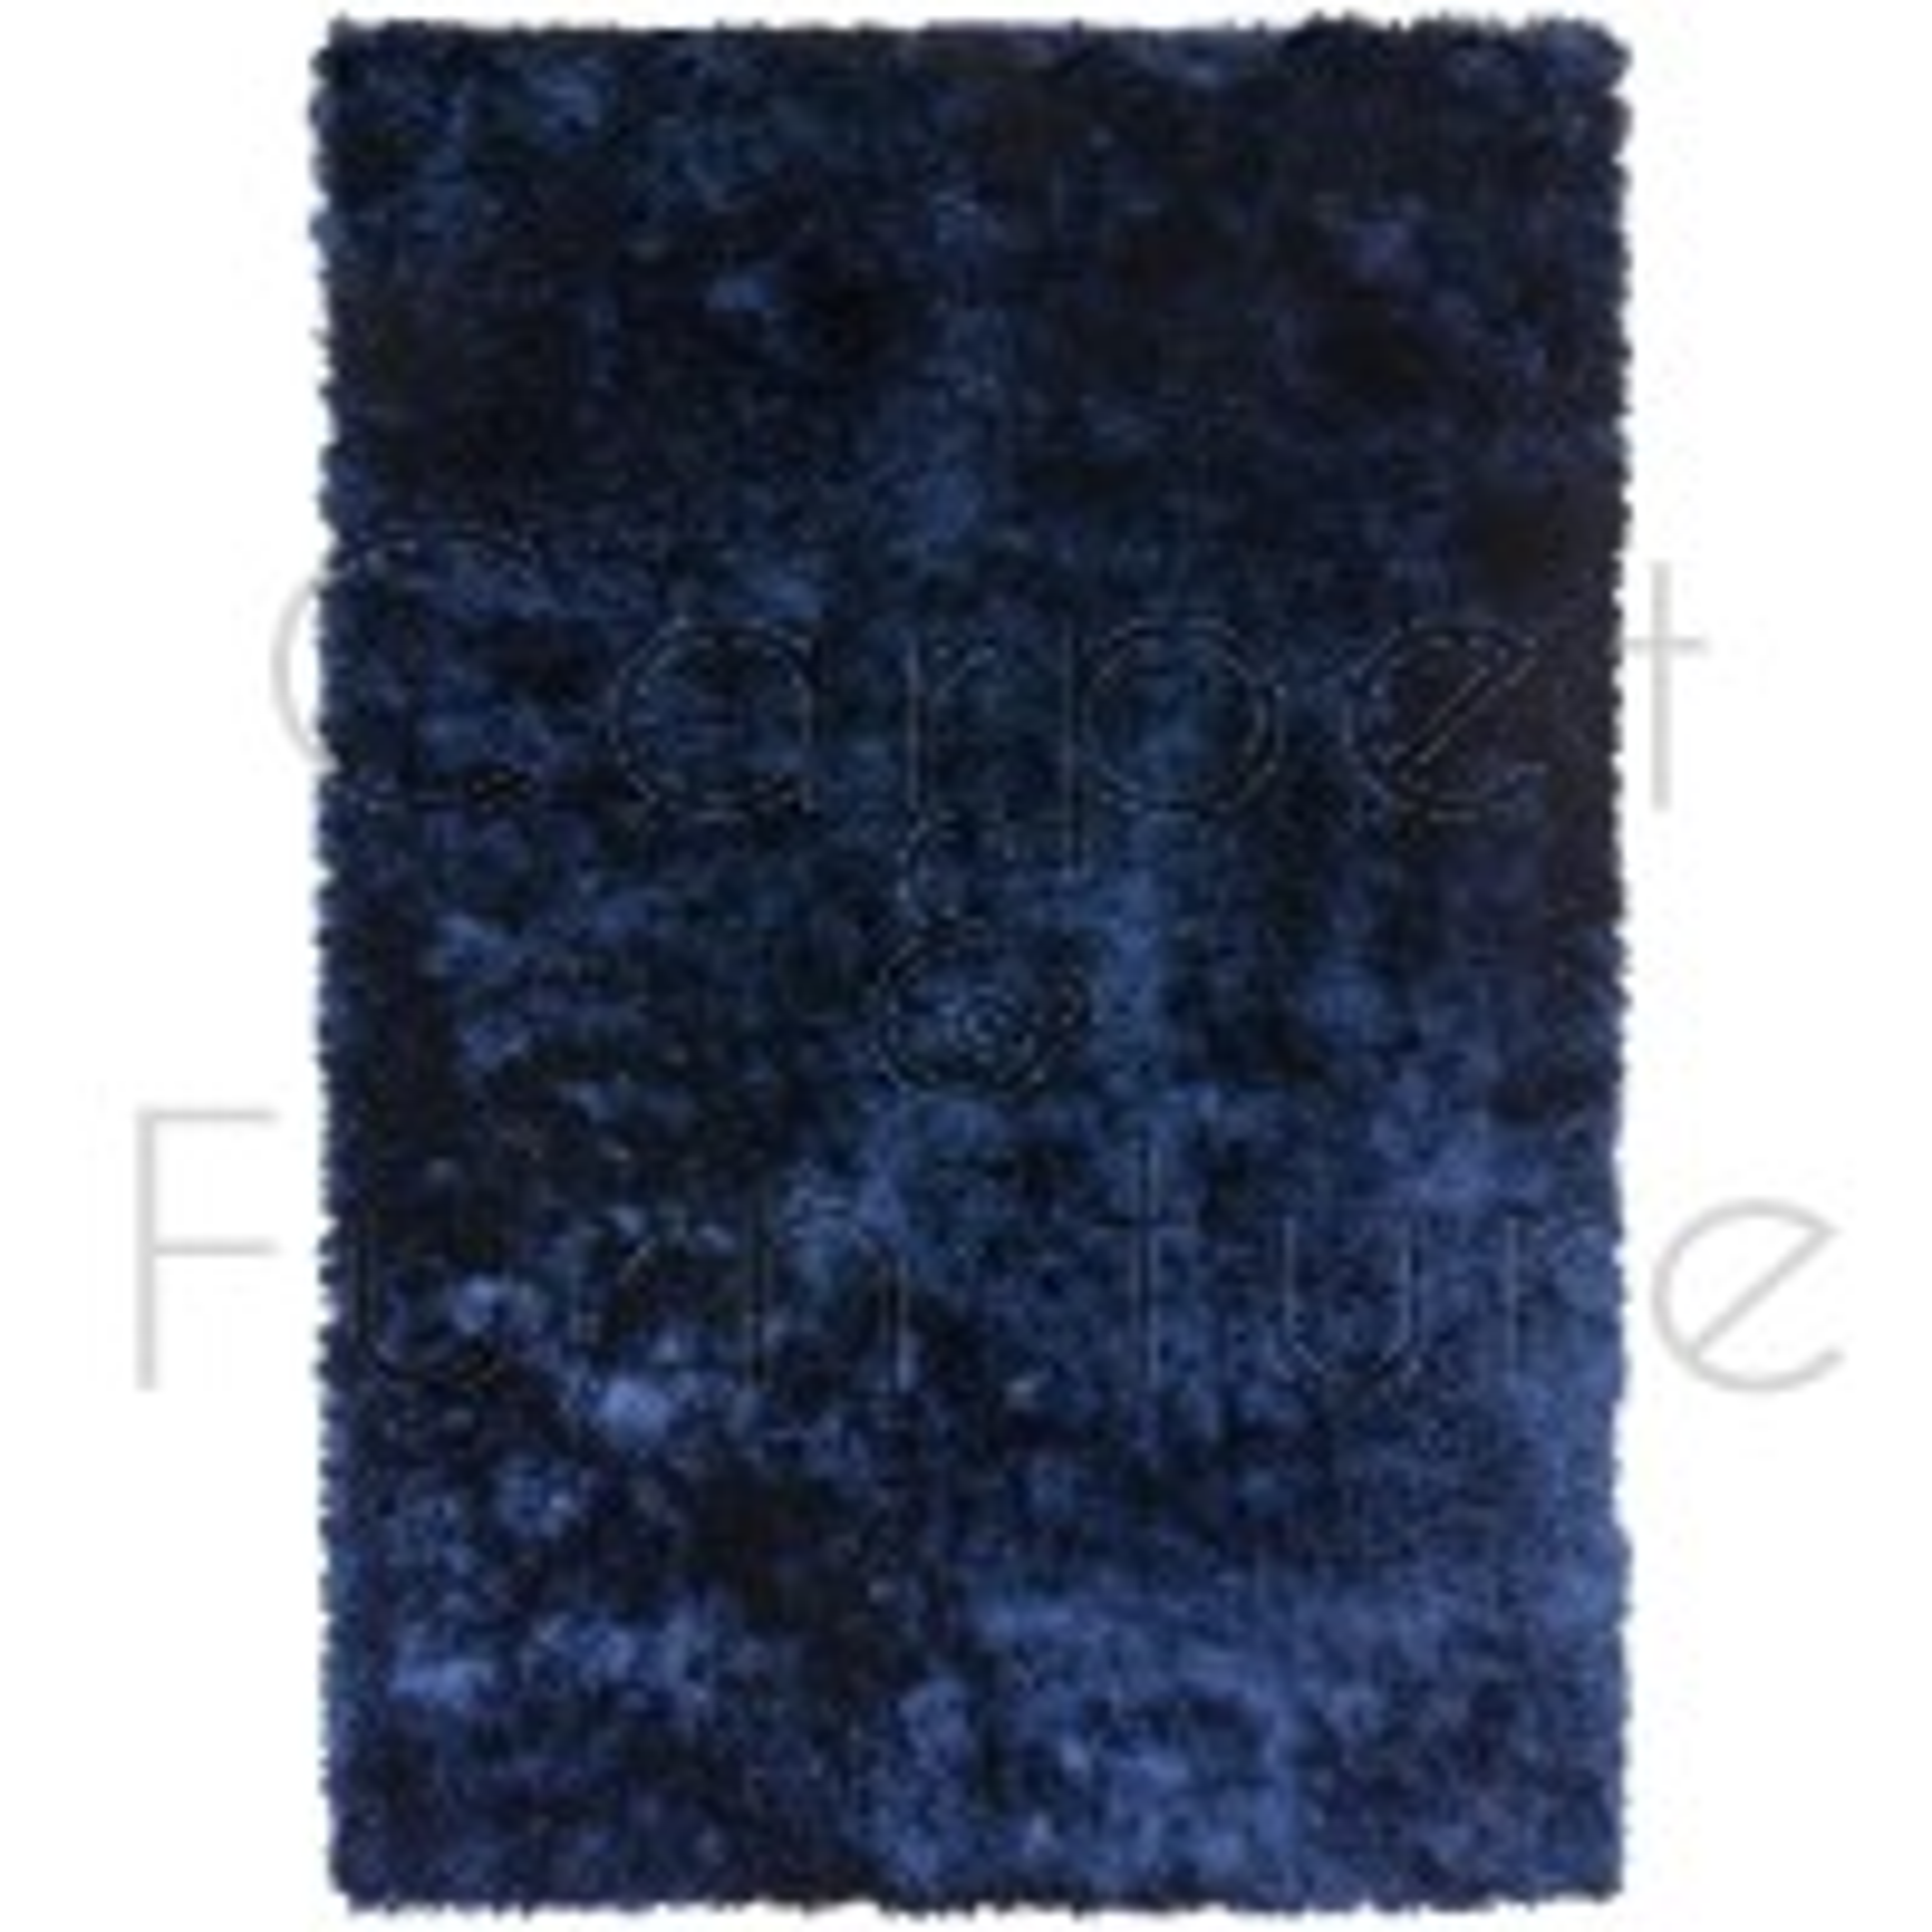 "Whisper Shaggy Rug - Navy Blue - Size 160 x 230 cm (5'3"" x 7'7"")"